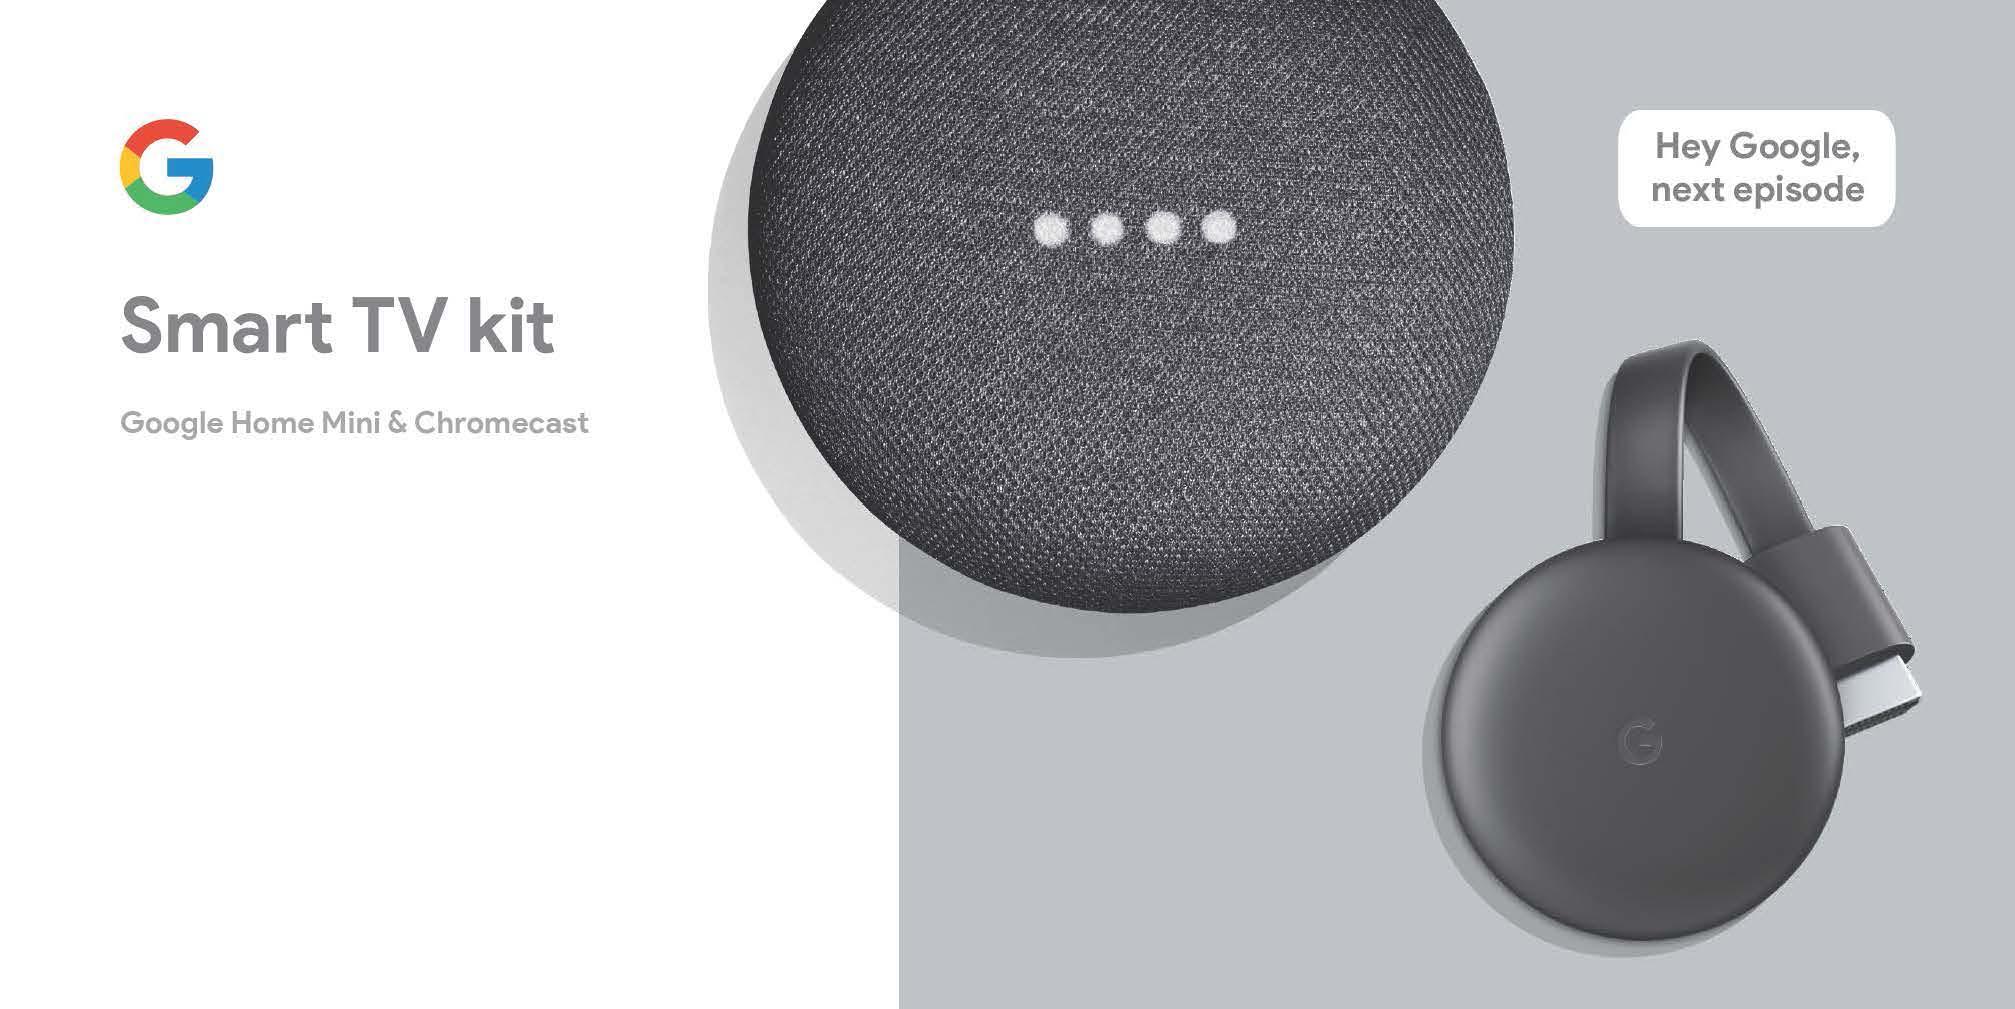 Walmart in store YMMV Google smart TV kit.(Home Mini & Chromecast) $13